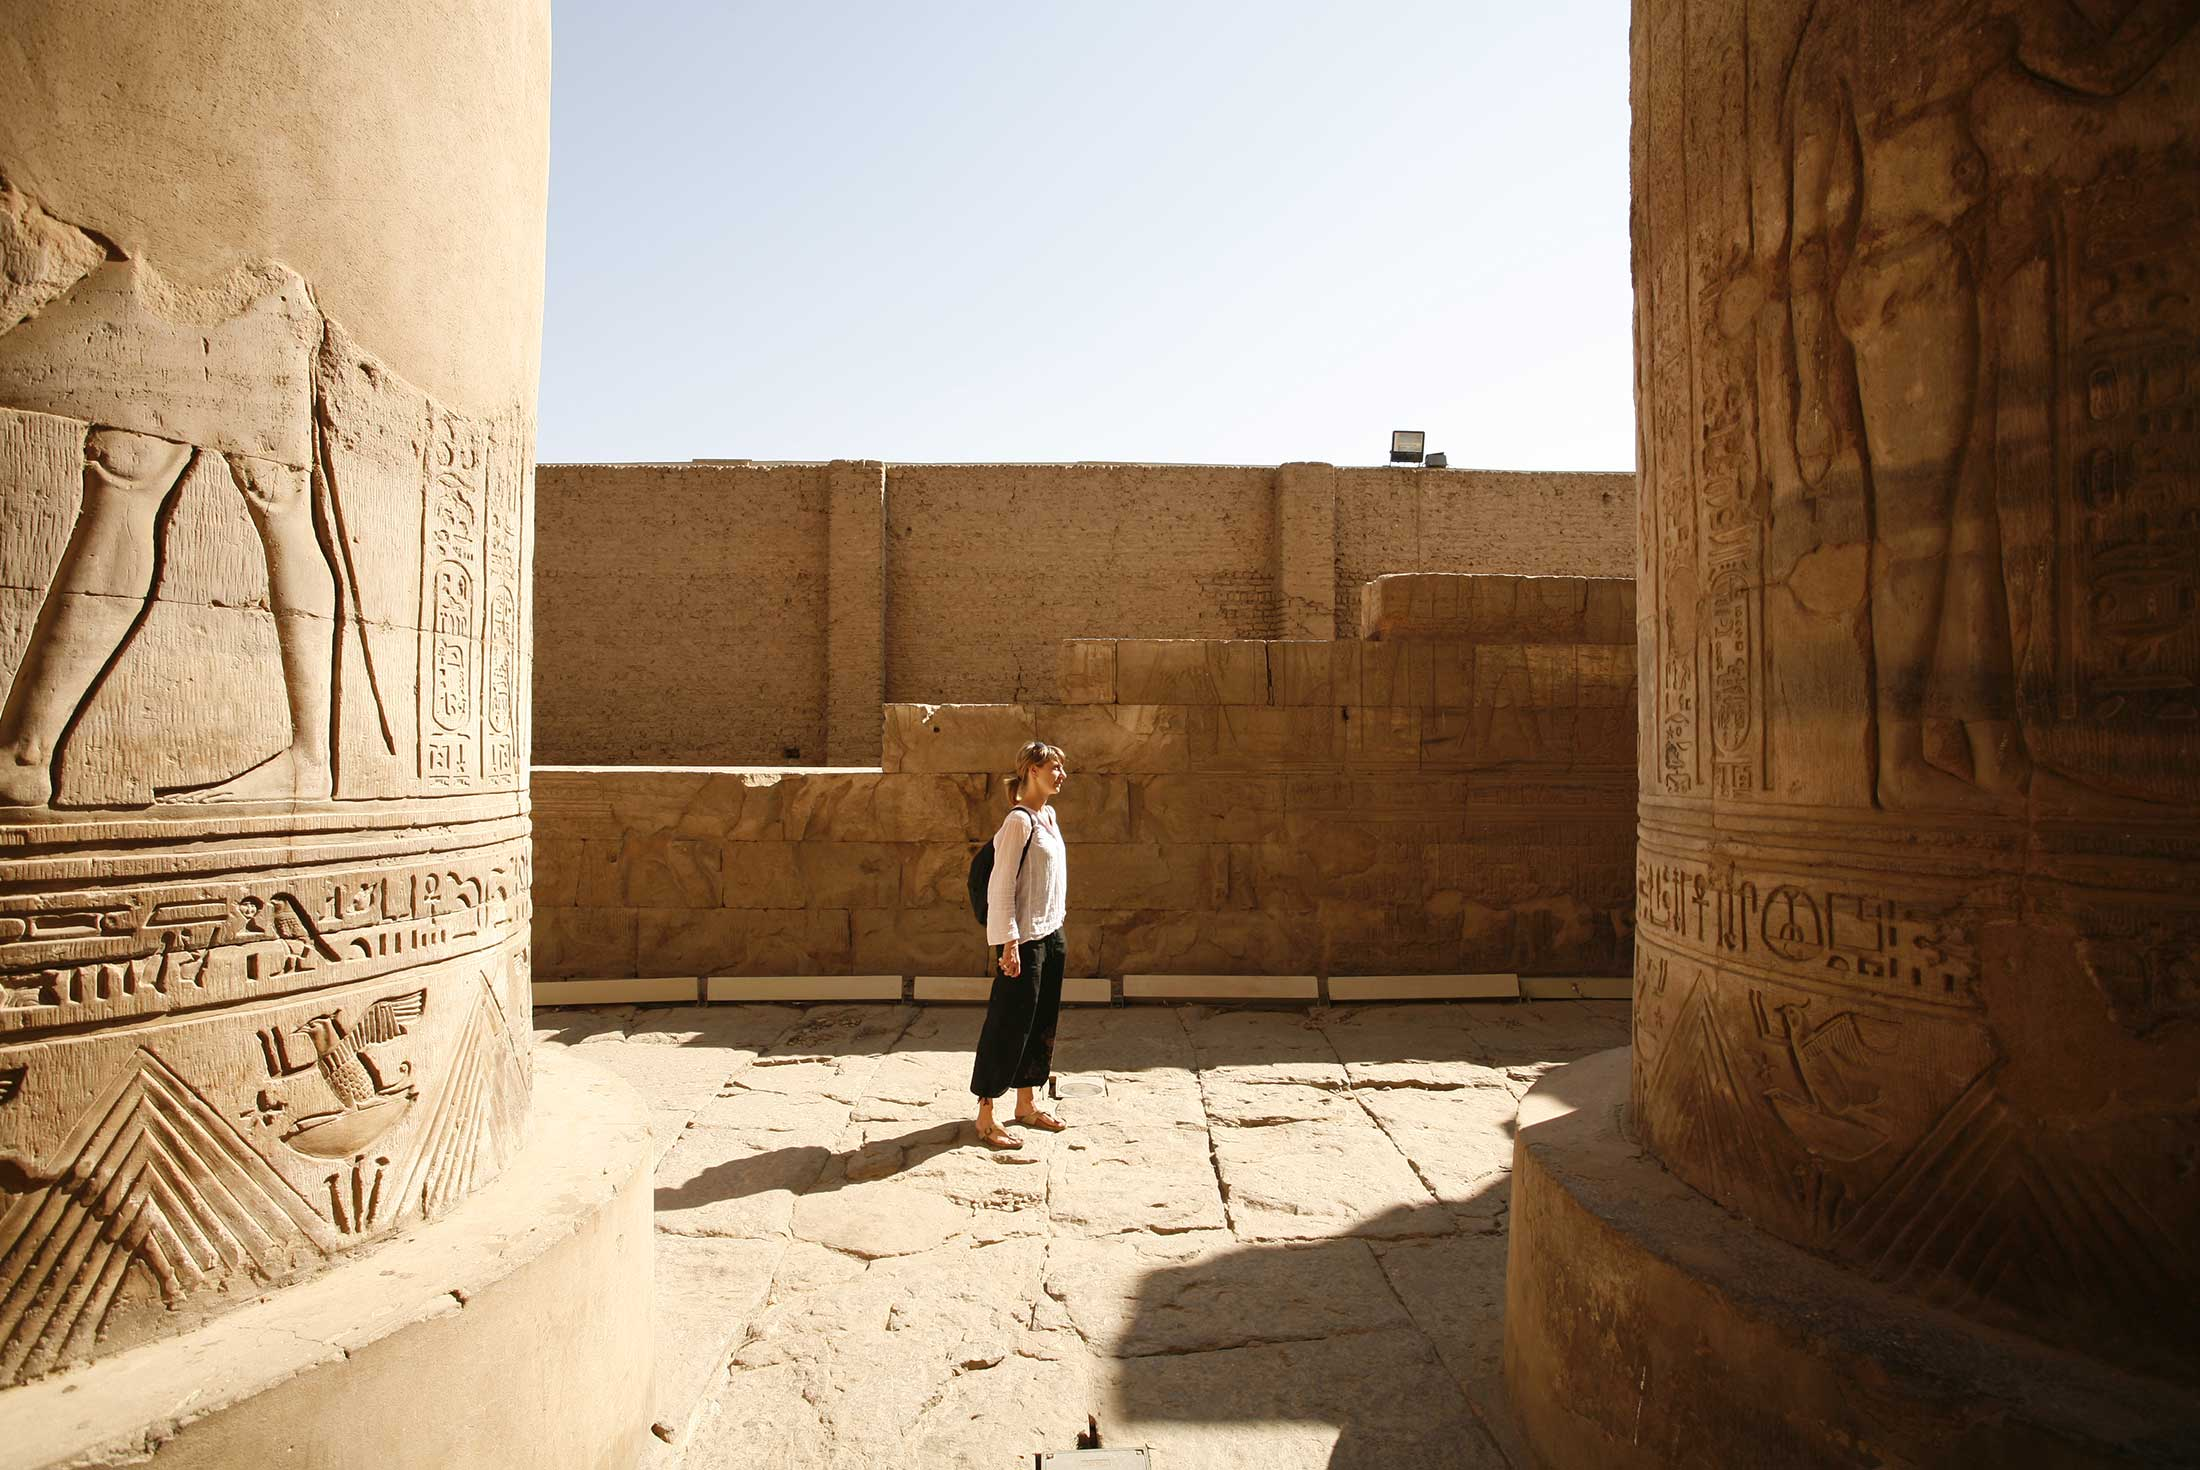 Pyramids, Mummies & Pharaohs 1